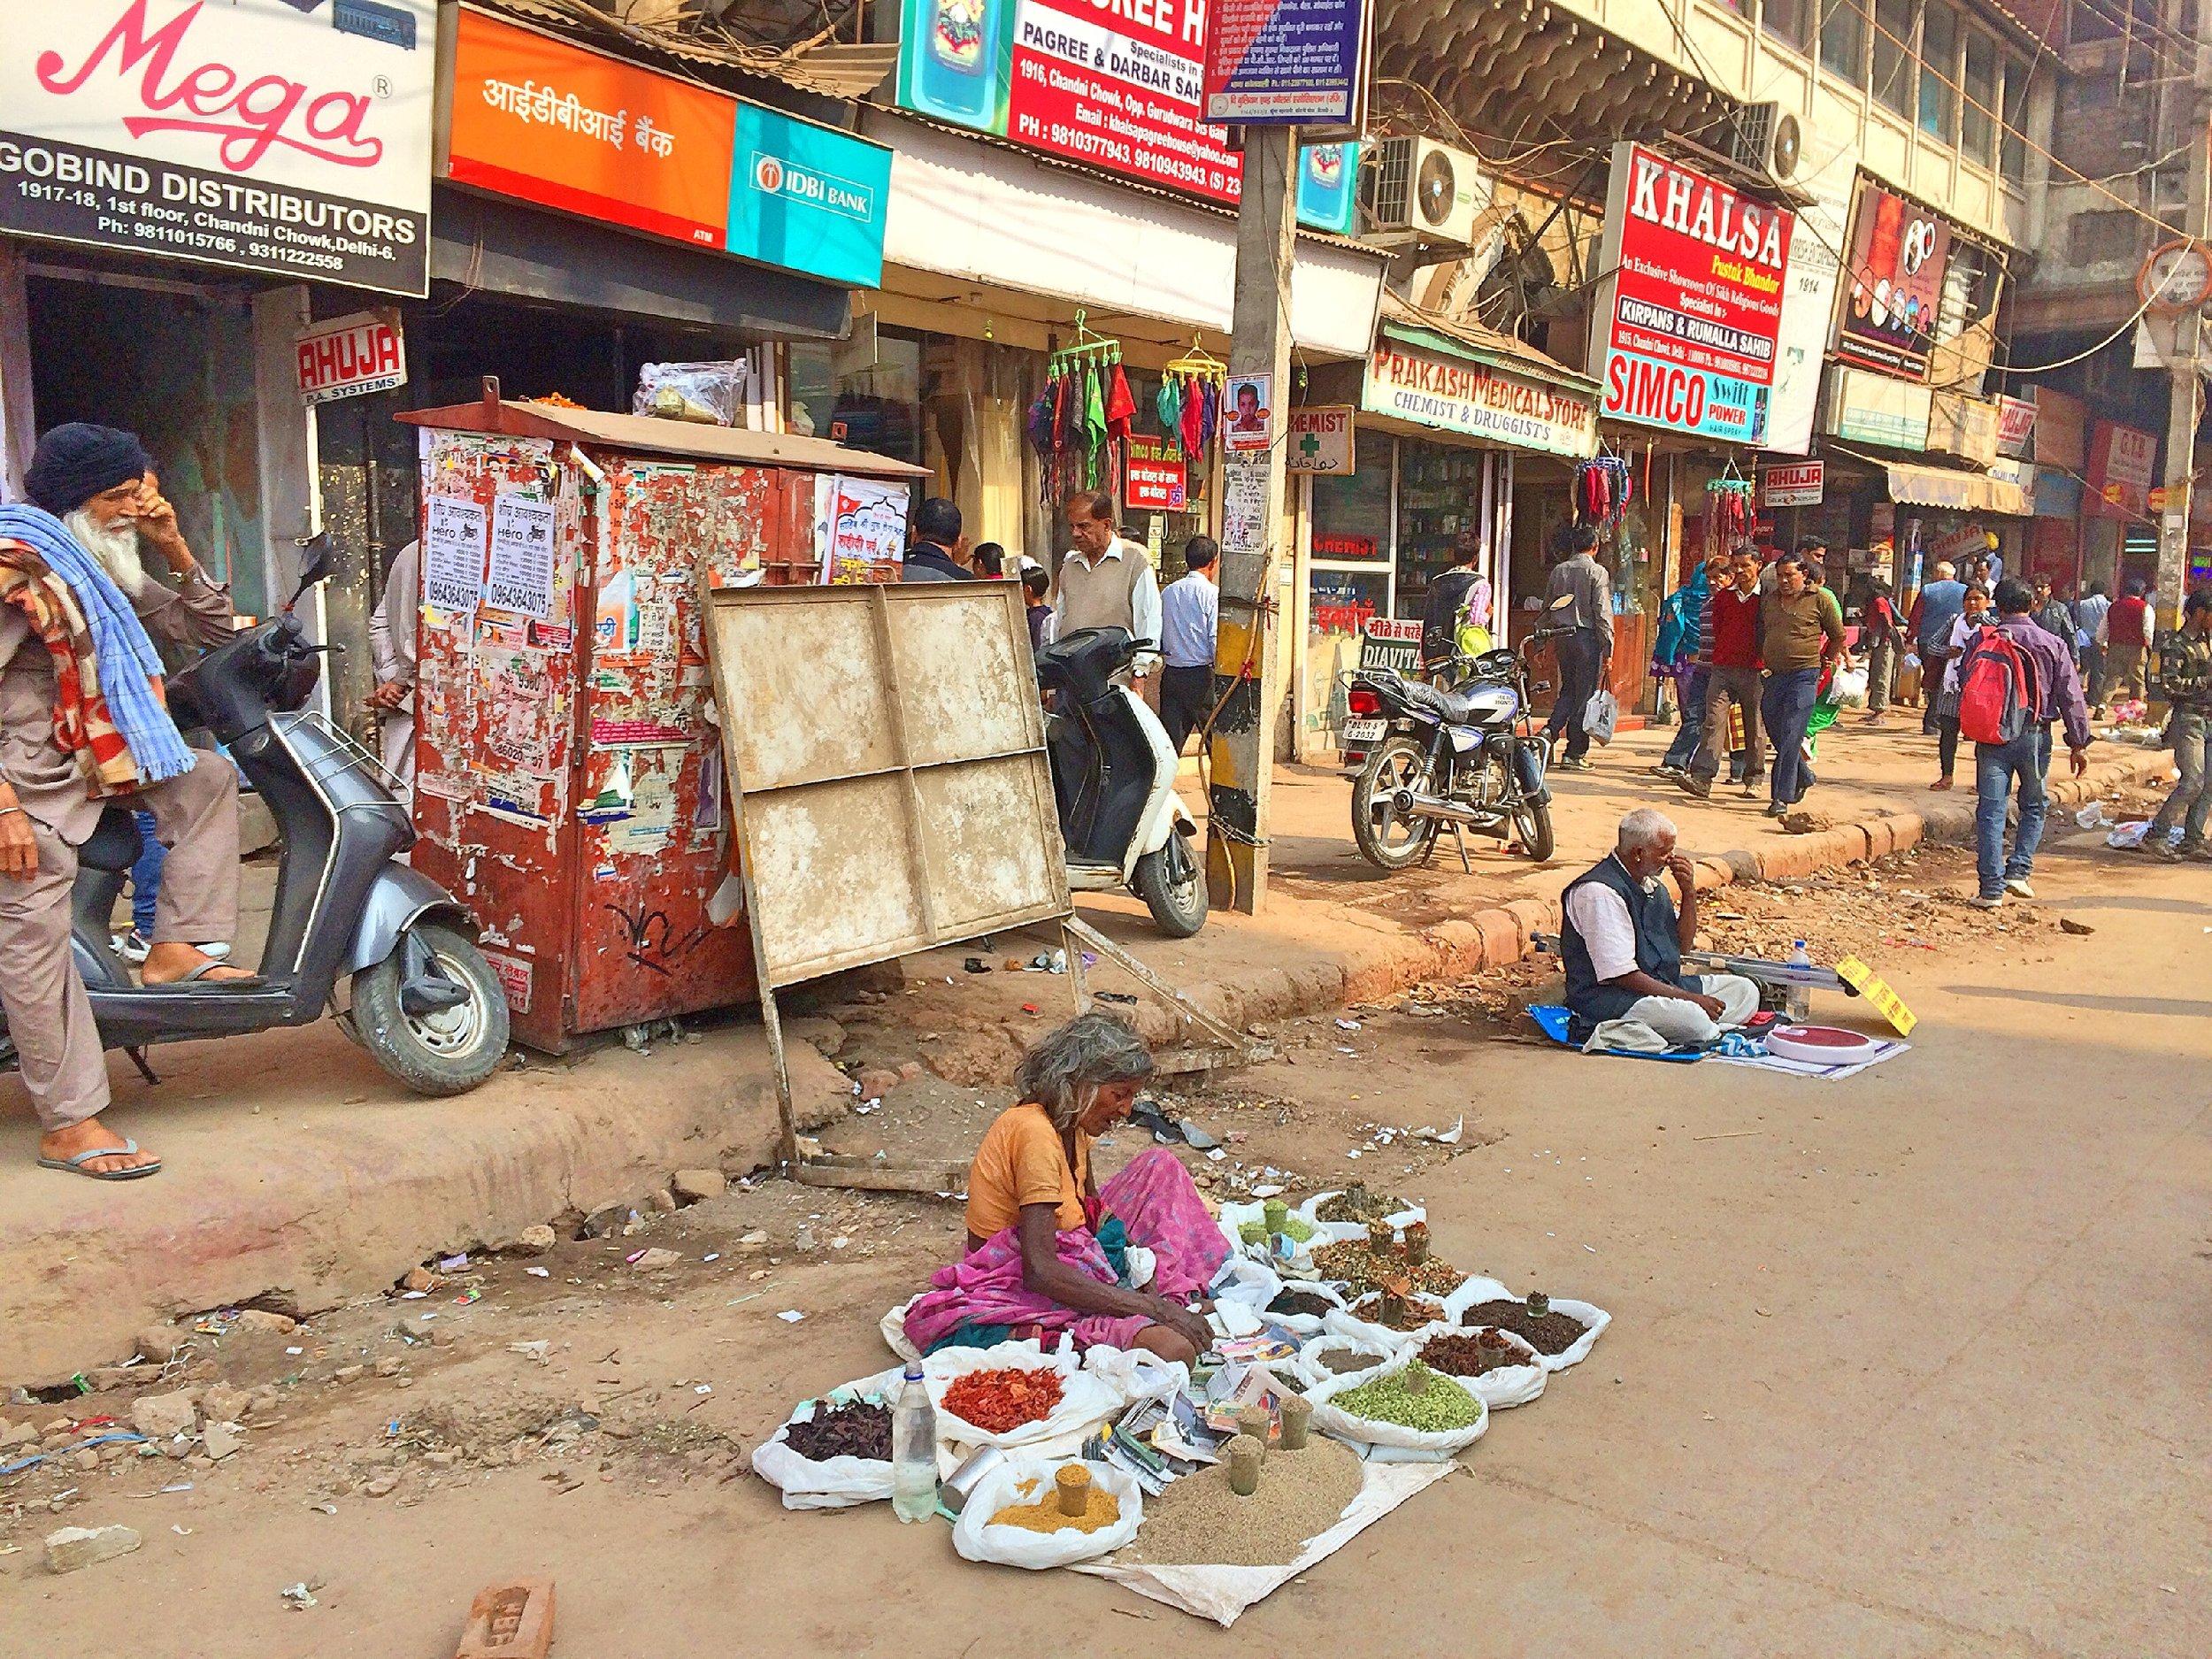 Street Markets, New Delhi, India